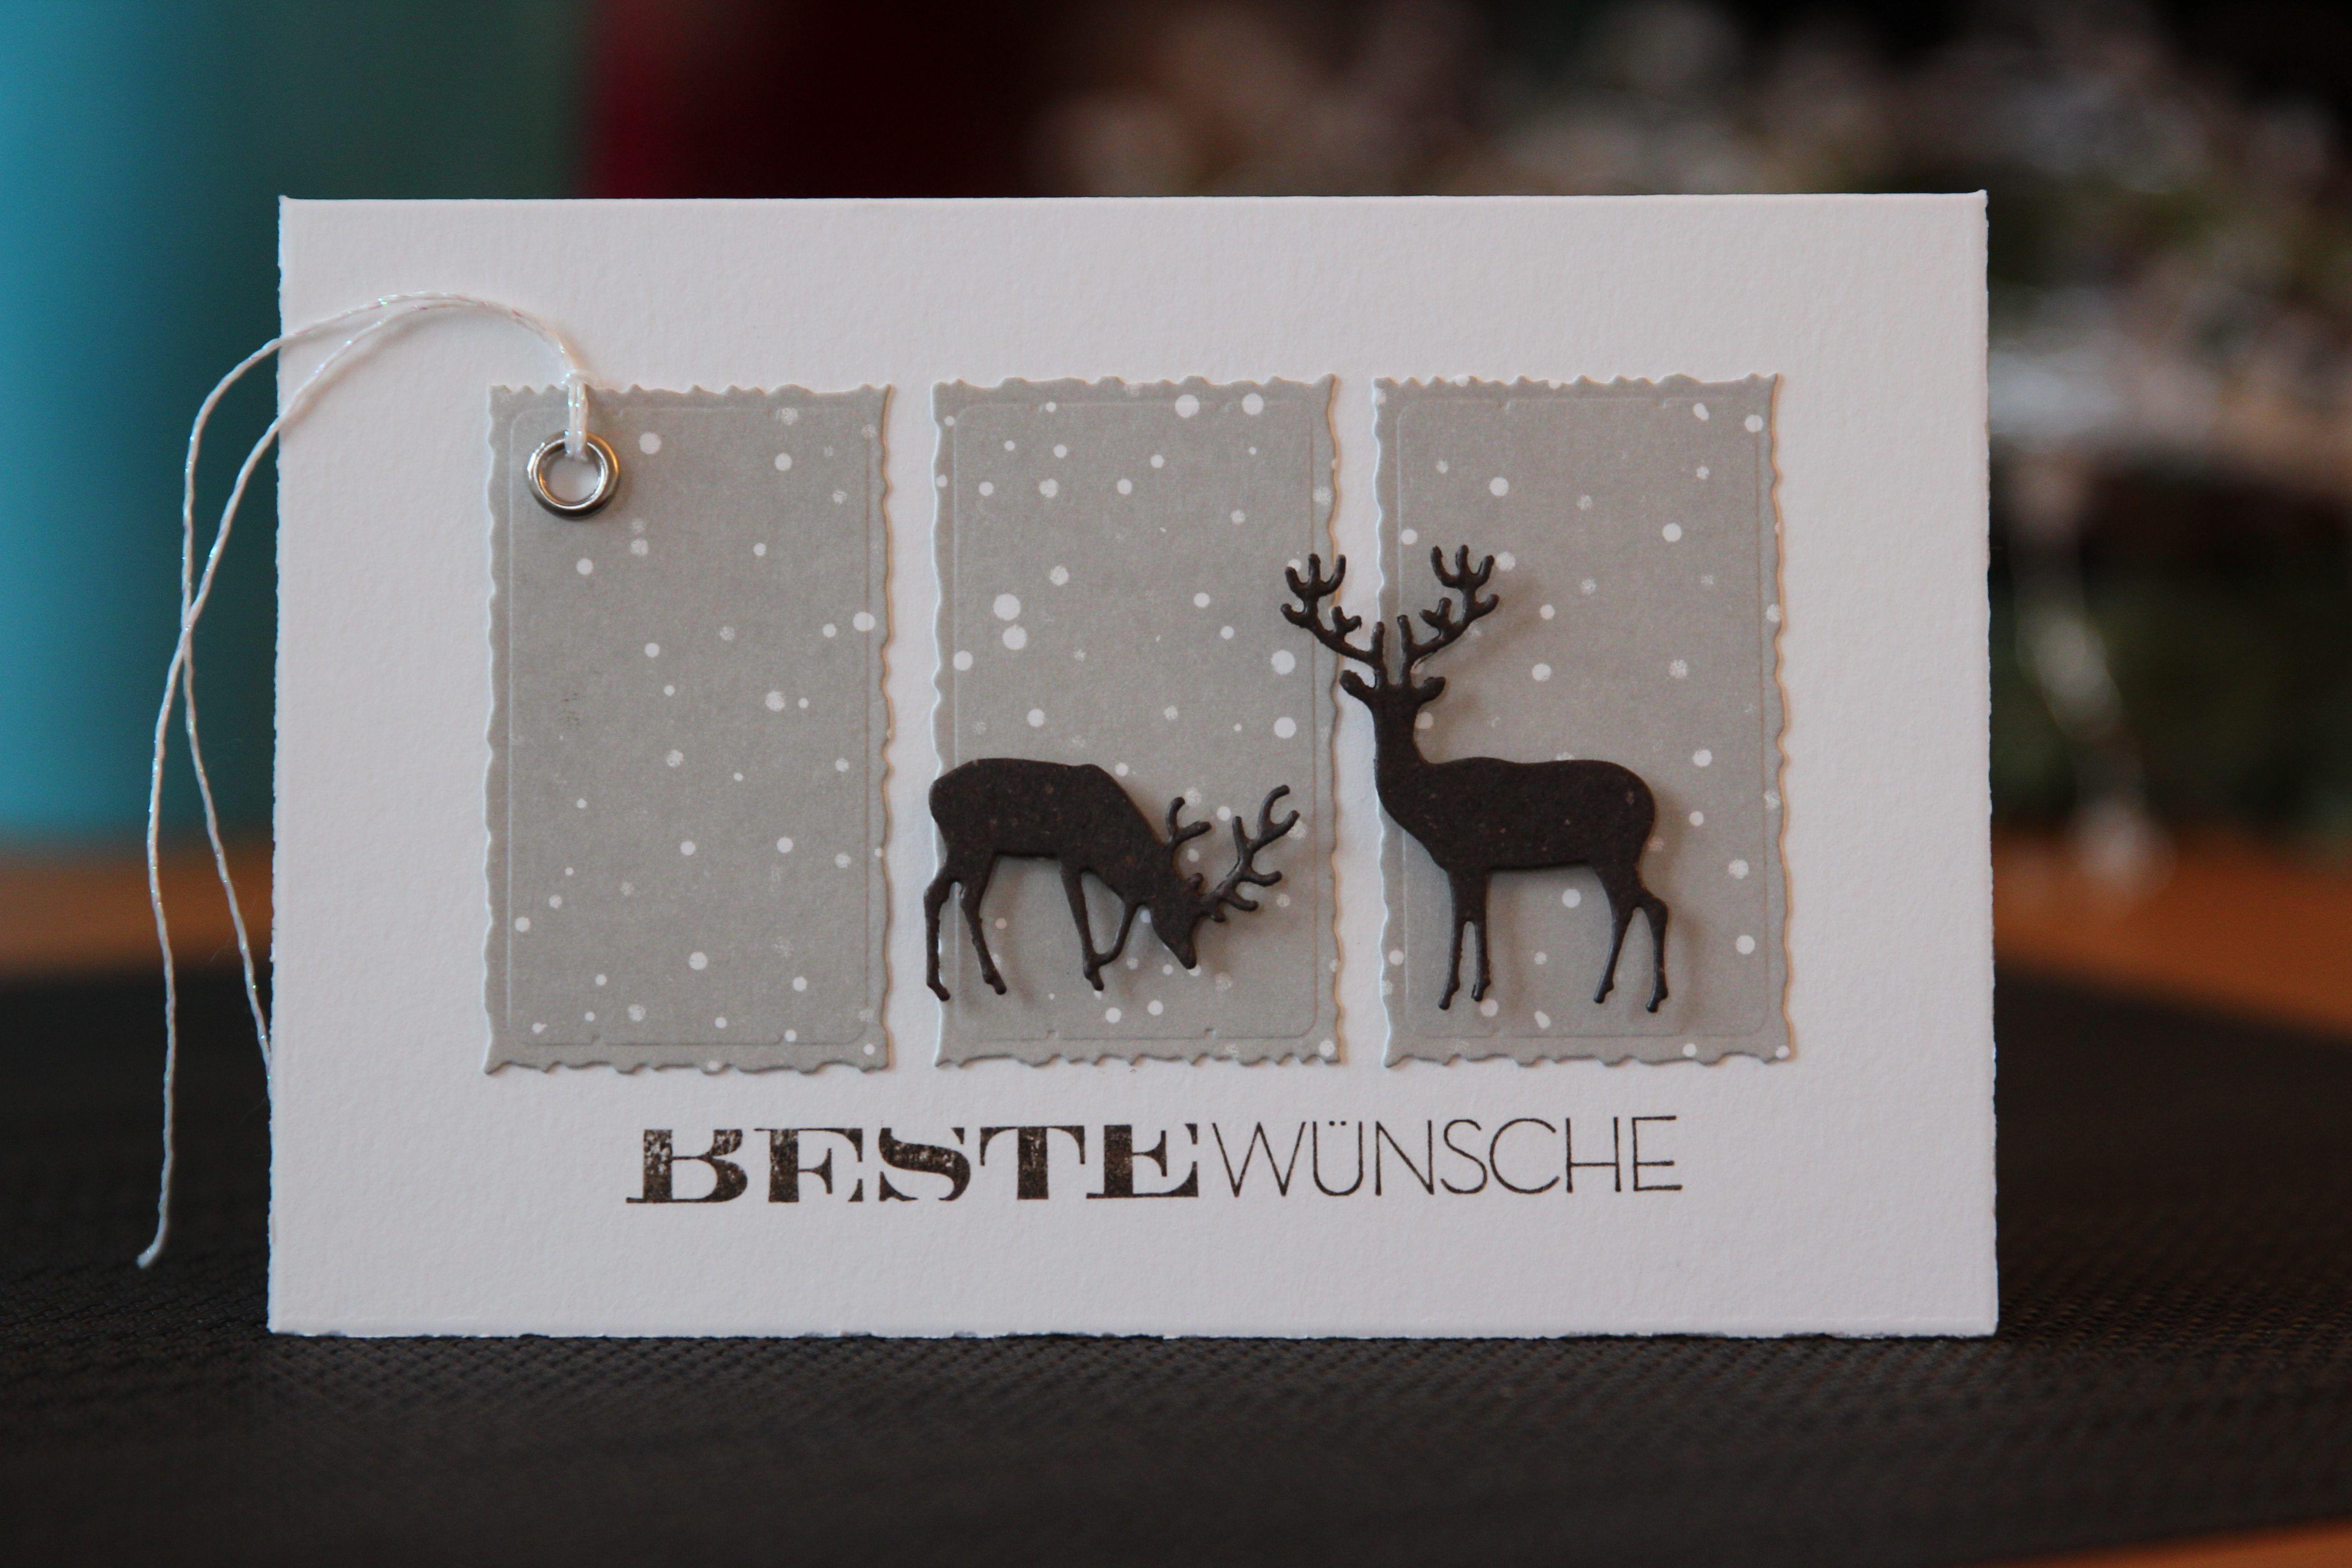 weihnachtsgr sse beste w nsche best christmas holidays. Black Bedroom Furniture Sets. Home Design Ideas